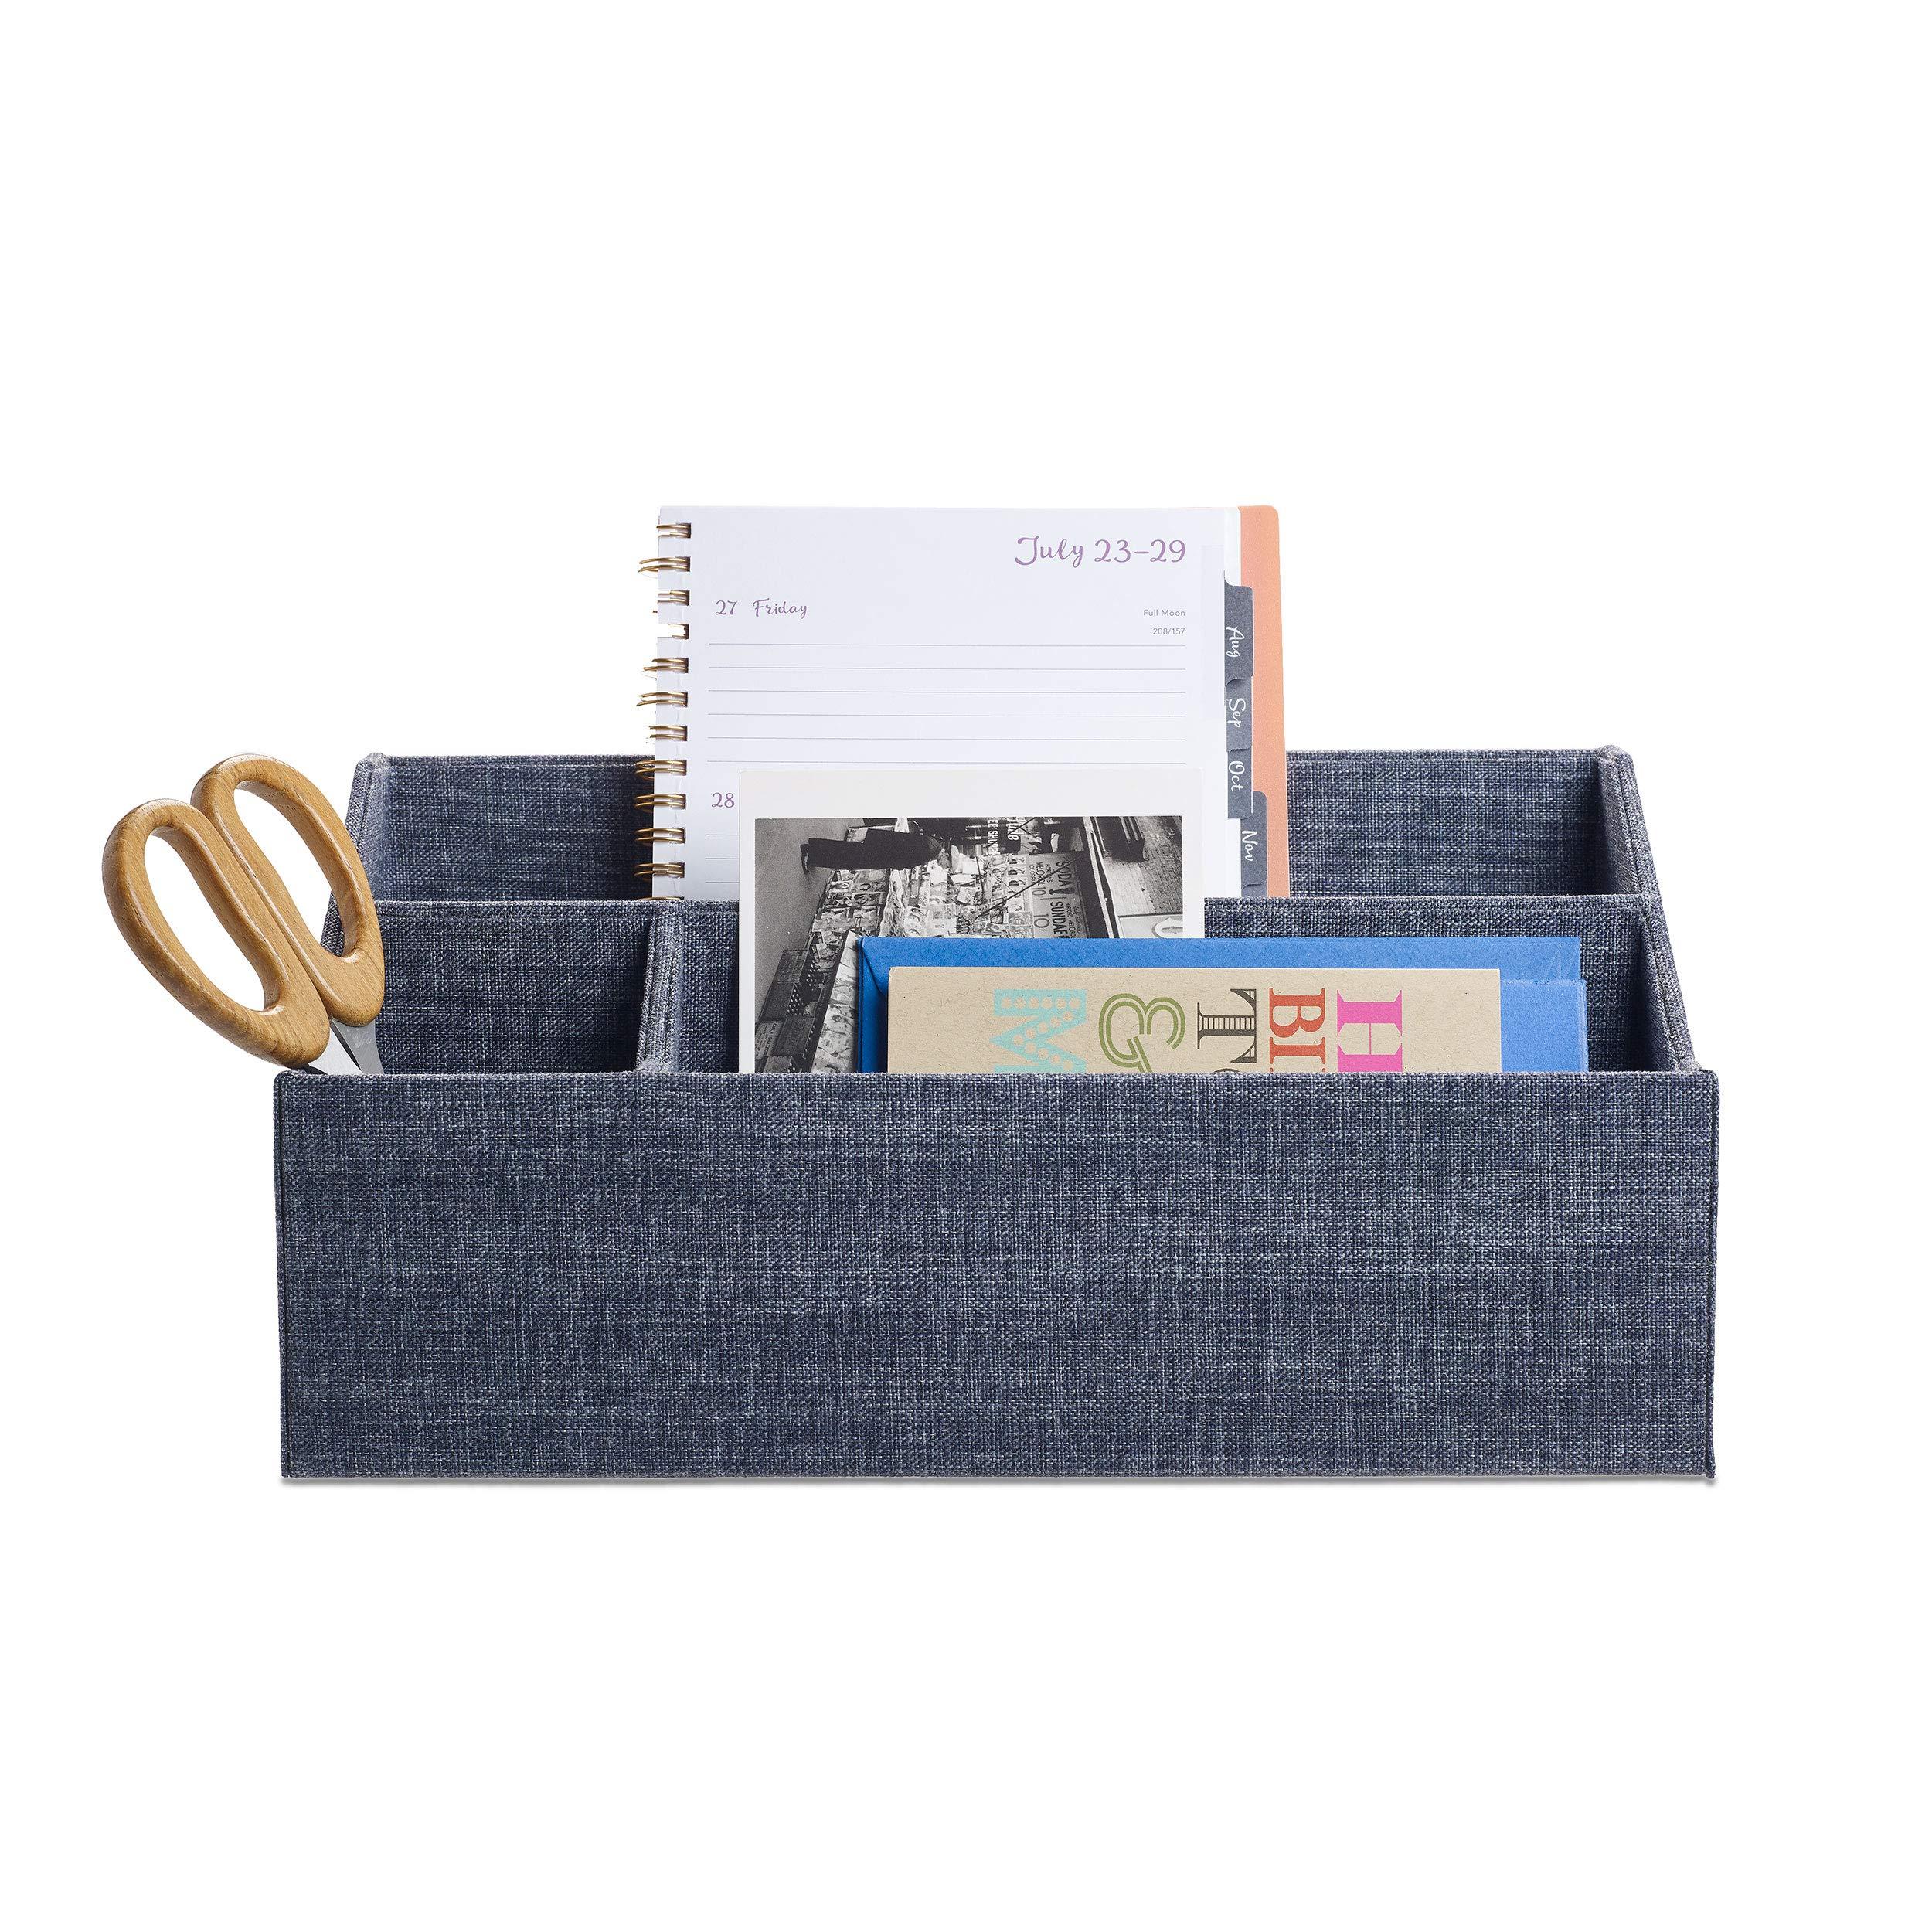 Design Ideas Indigo Desk Organizer, Denim Blue Jean Fabric Covered Paperboard Desktop Bin by Design Ideas